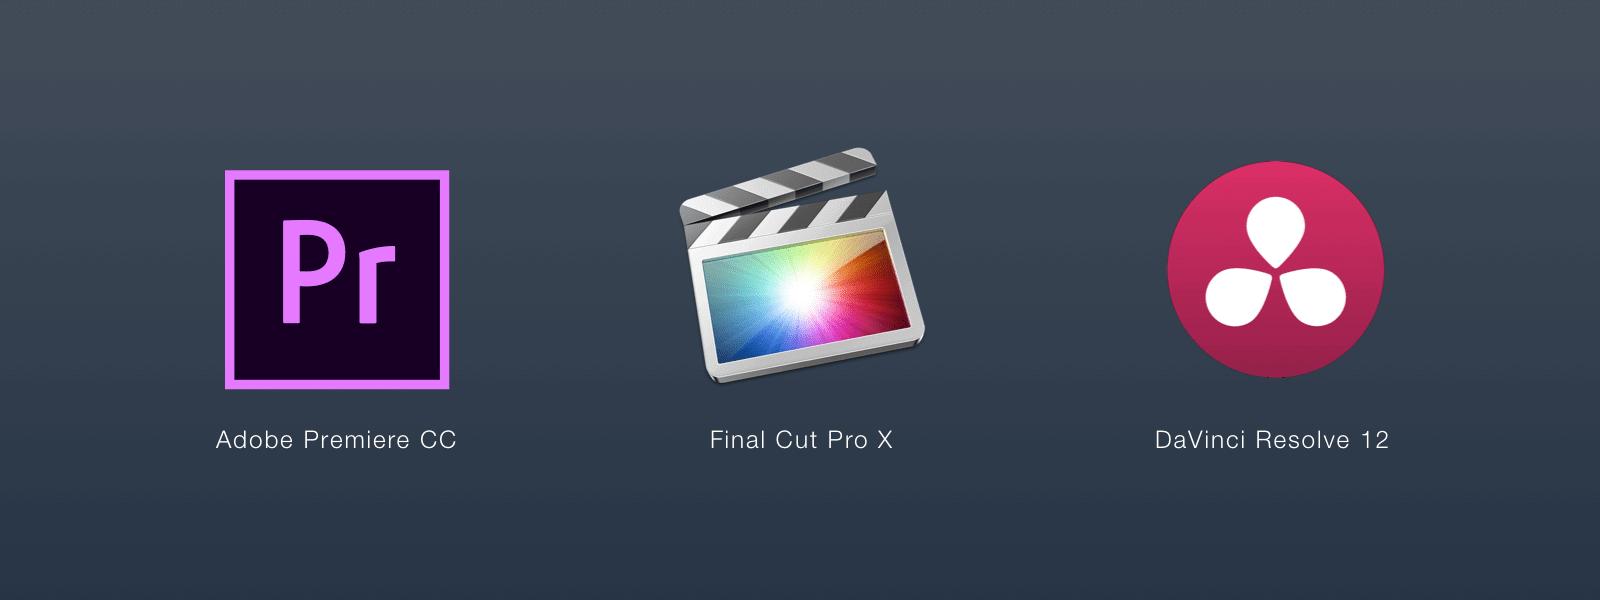 31 Best Filmmaker Software and Tools of 2016 - Adobe Premiere CC - Final Cut X - DaVinci Resolve 12